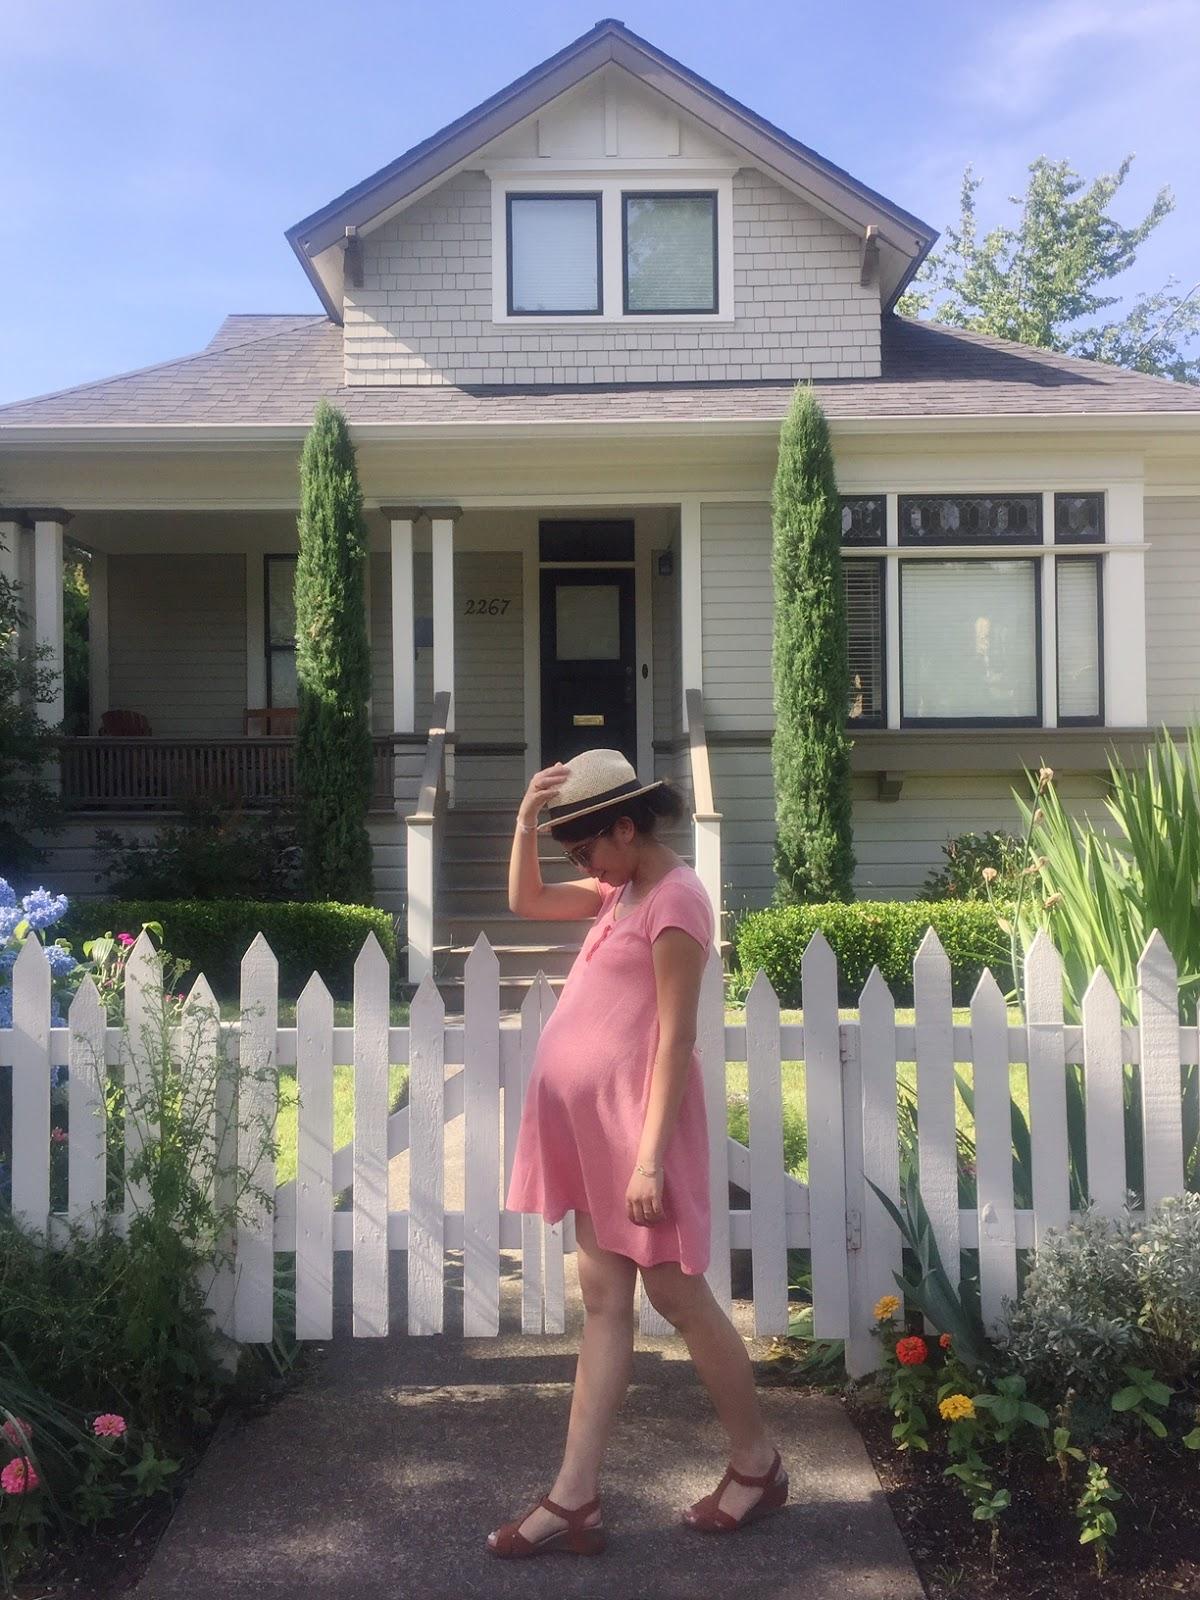 portland fashion blogger, lifestyle blogger, brown sandals, merrell, wide brim hat, nordstrom rack, thirty bucks, red lace up dress, derek heart, toms sunglasses